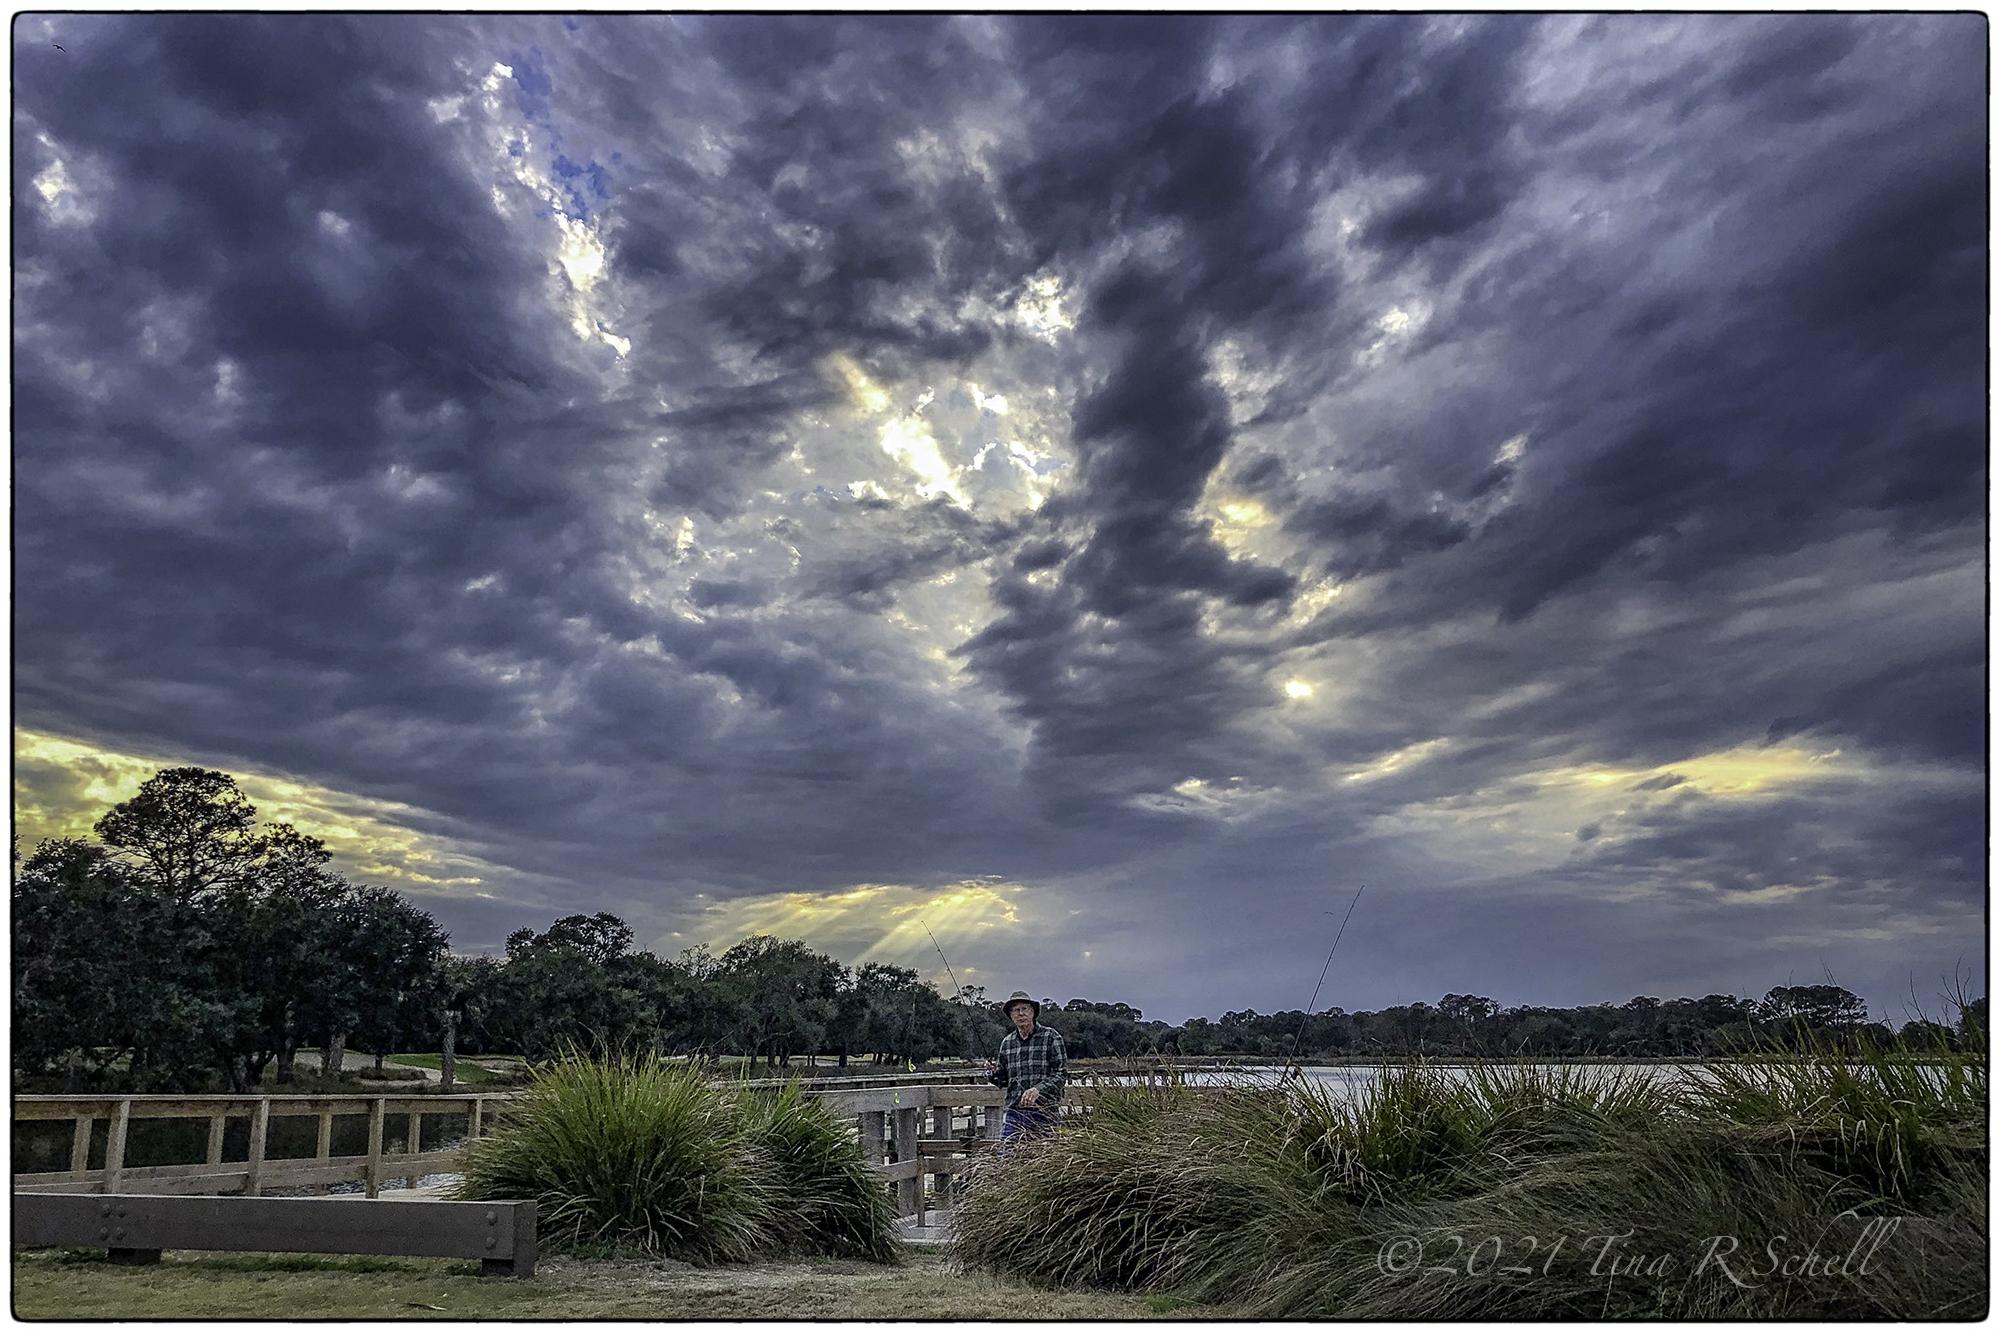 storm, kiawah island, fisherman, dock